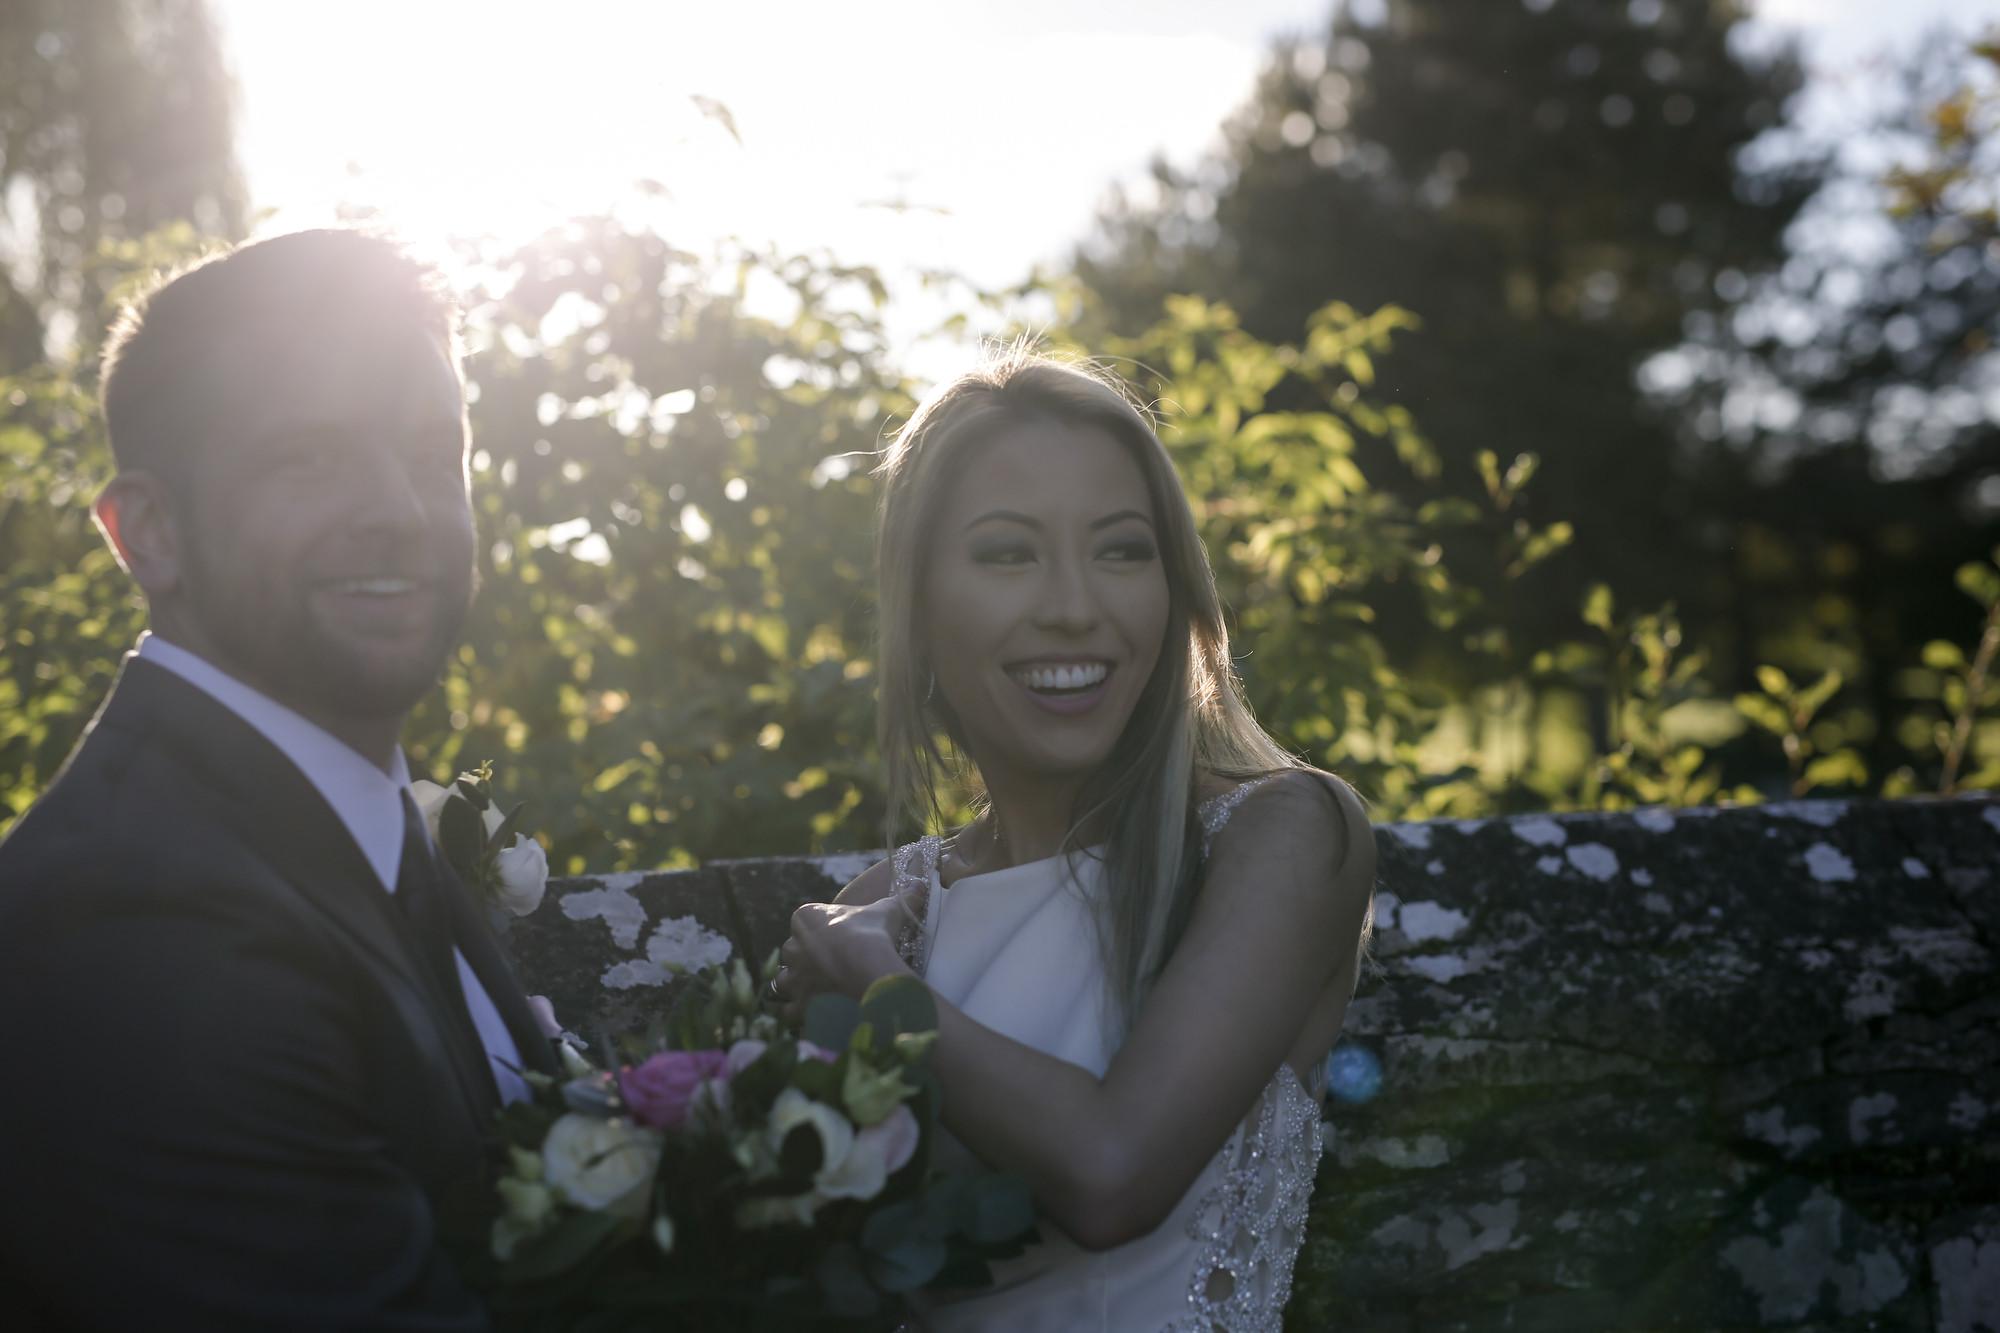 kilkea_castle_wedding_photographer_goldenmoments_045.jpg